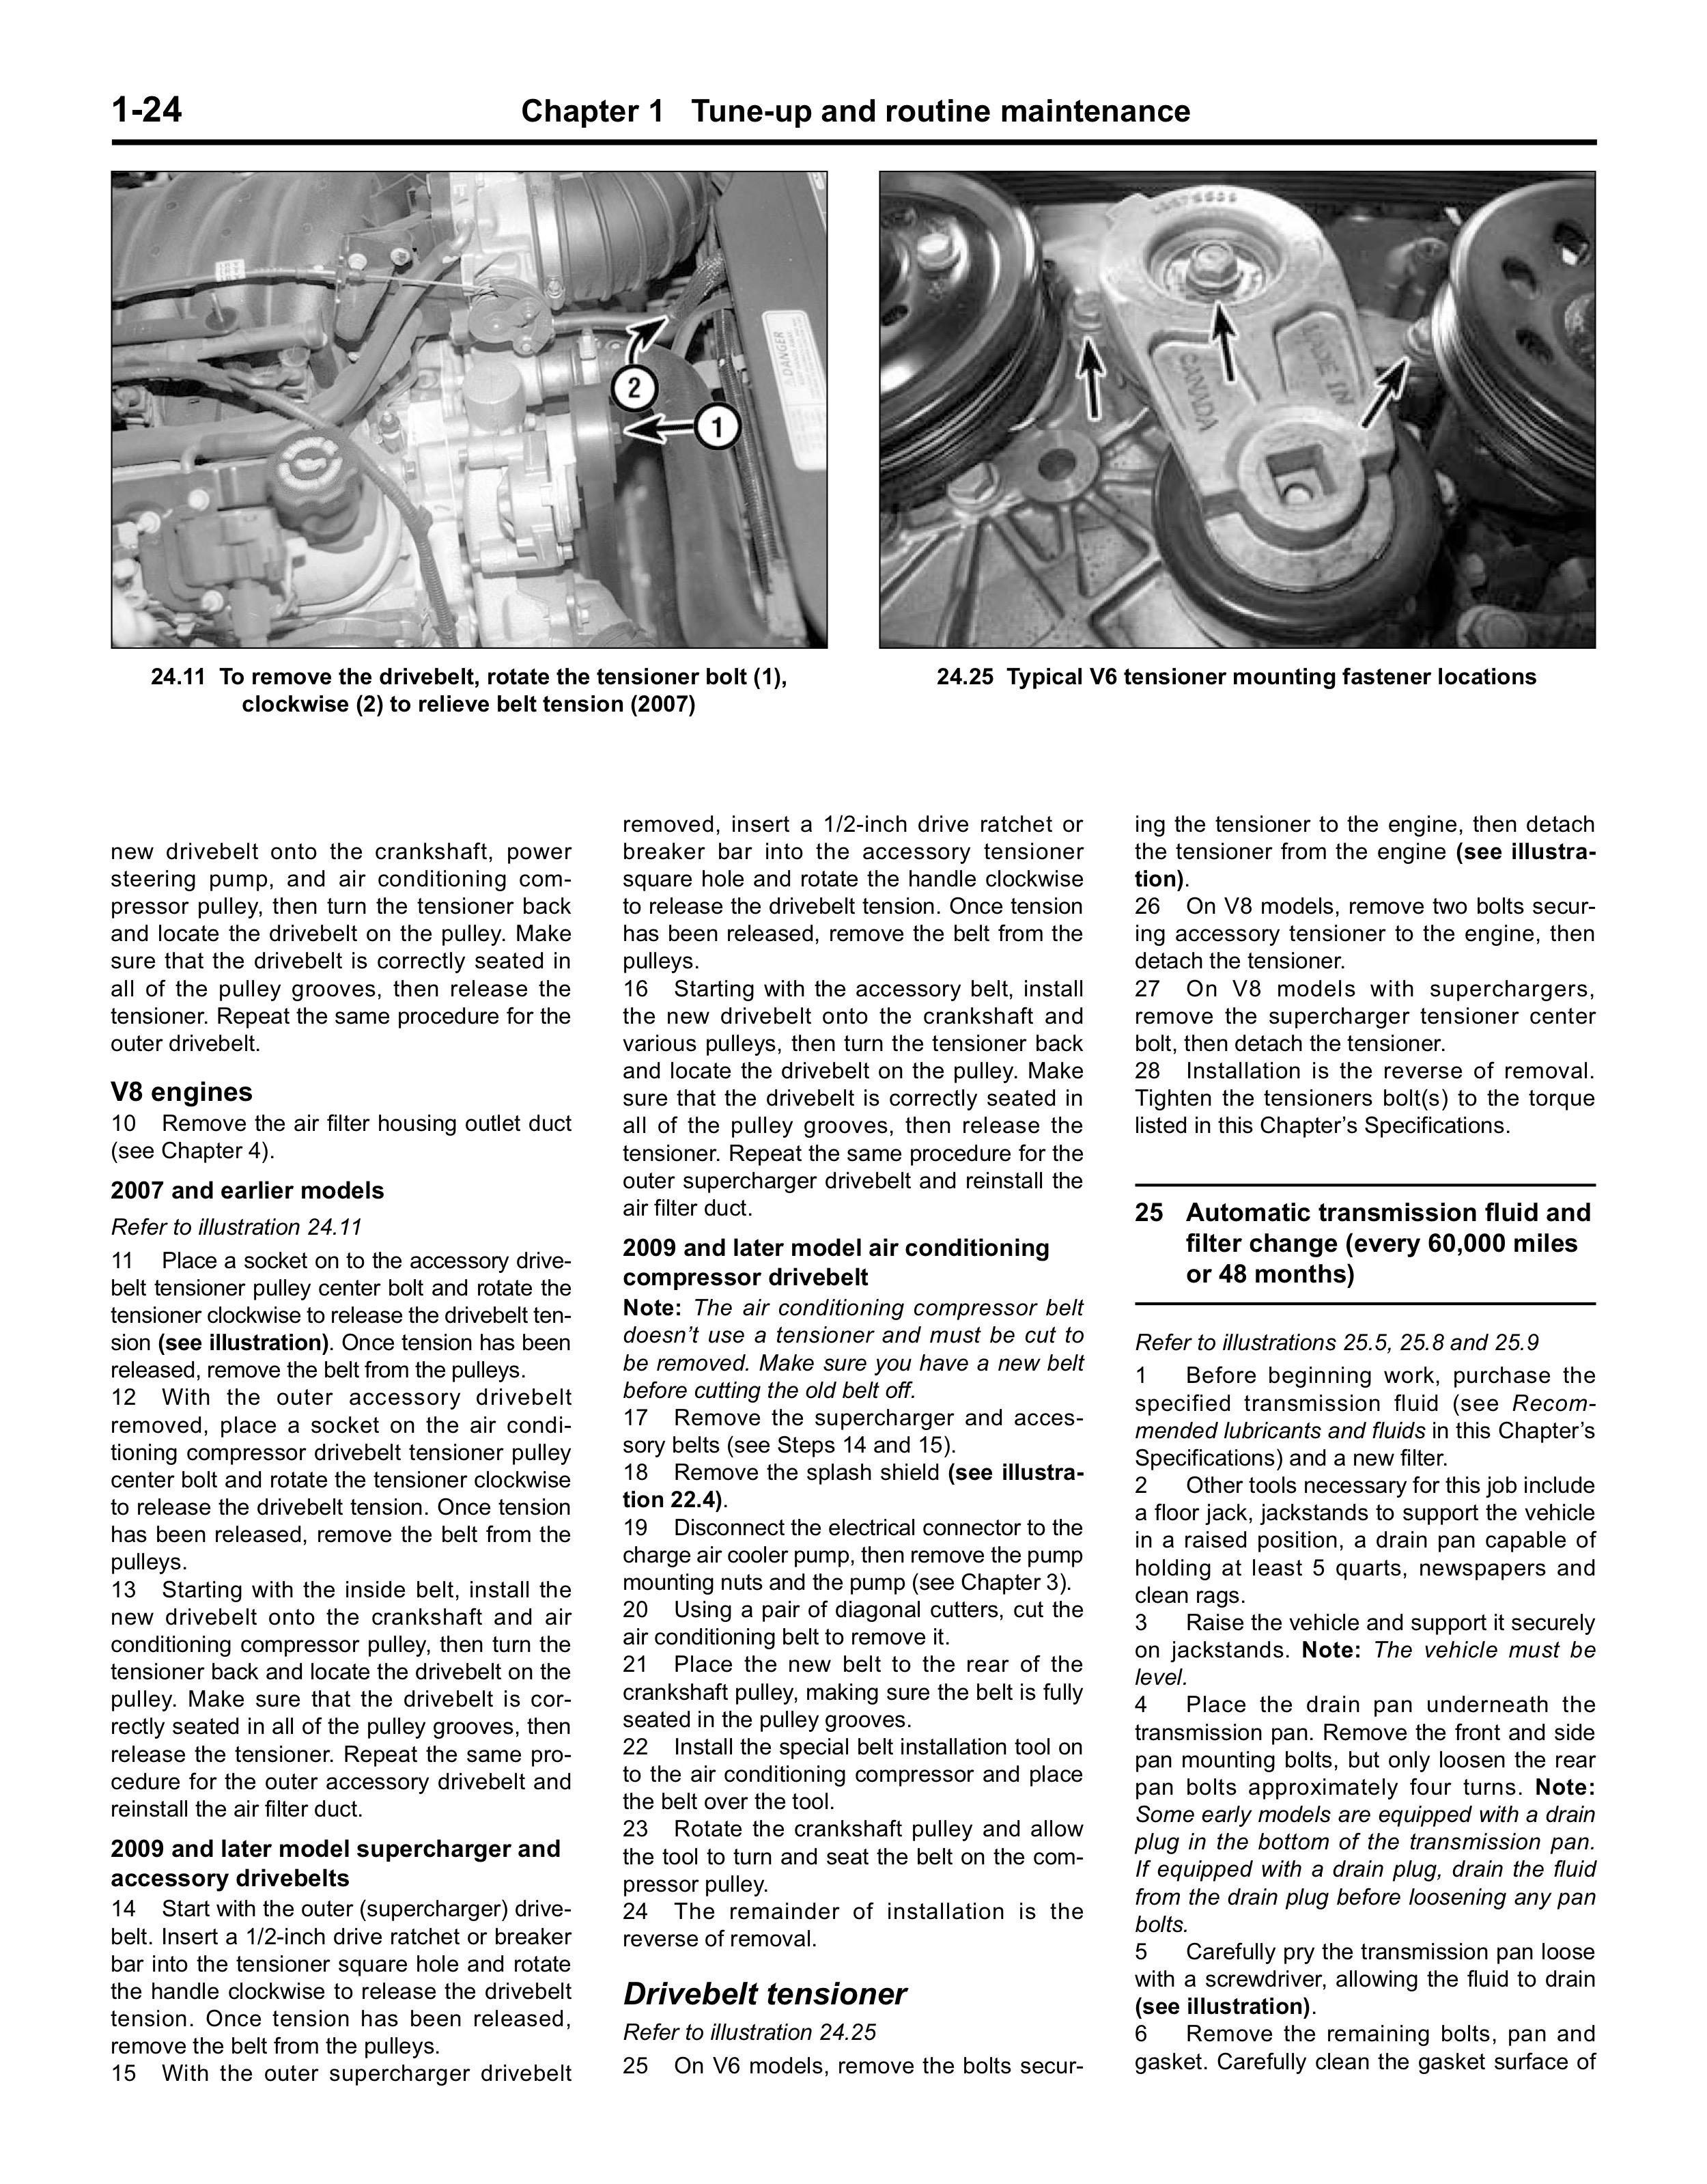 chevrolet sprint geo chevrolet metro 85 01 haynes repair manual rh haynes com Haynes Manual for Quads Haynes Manuals for 2003 Jeep